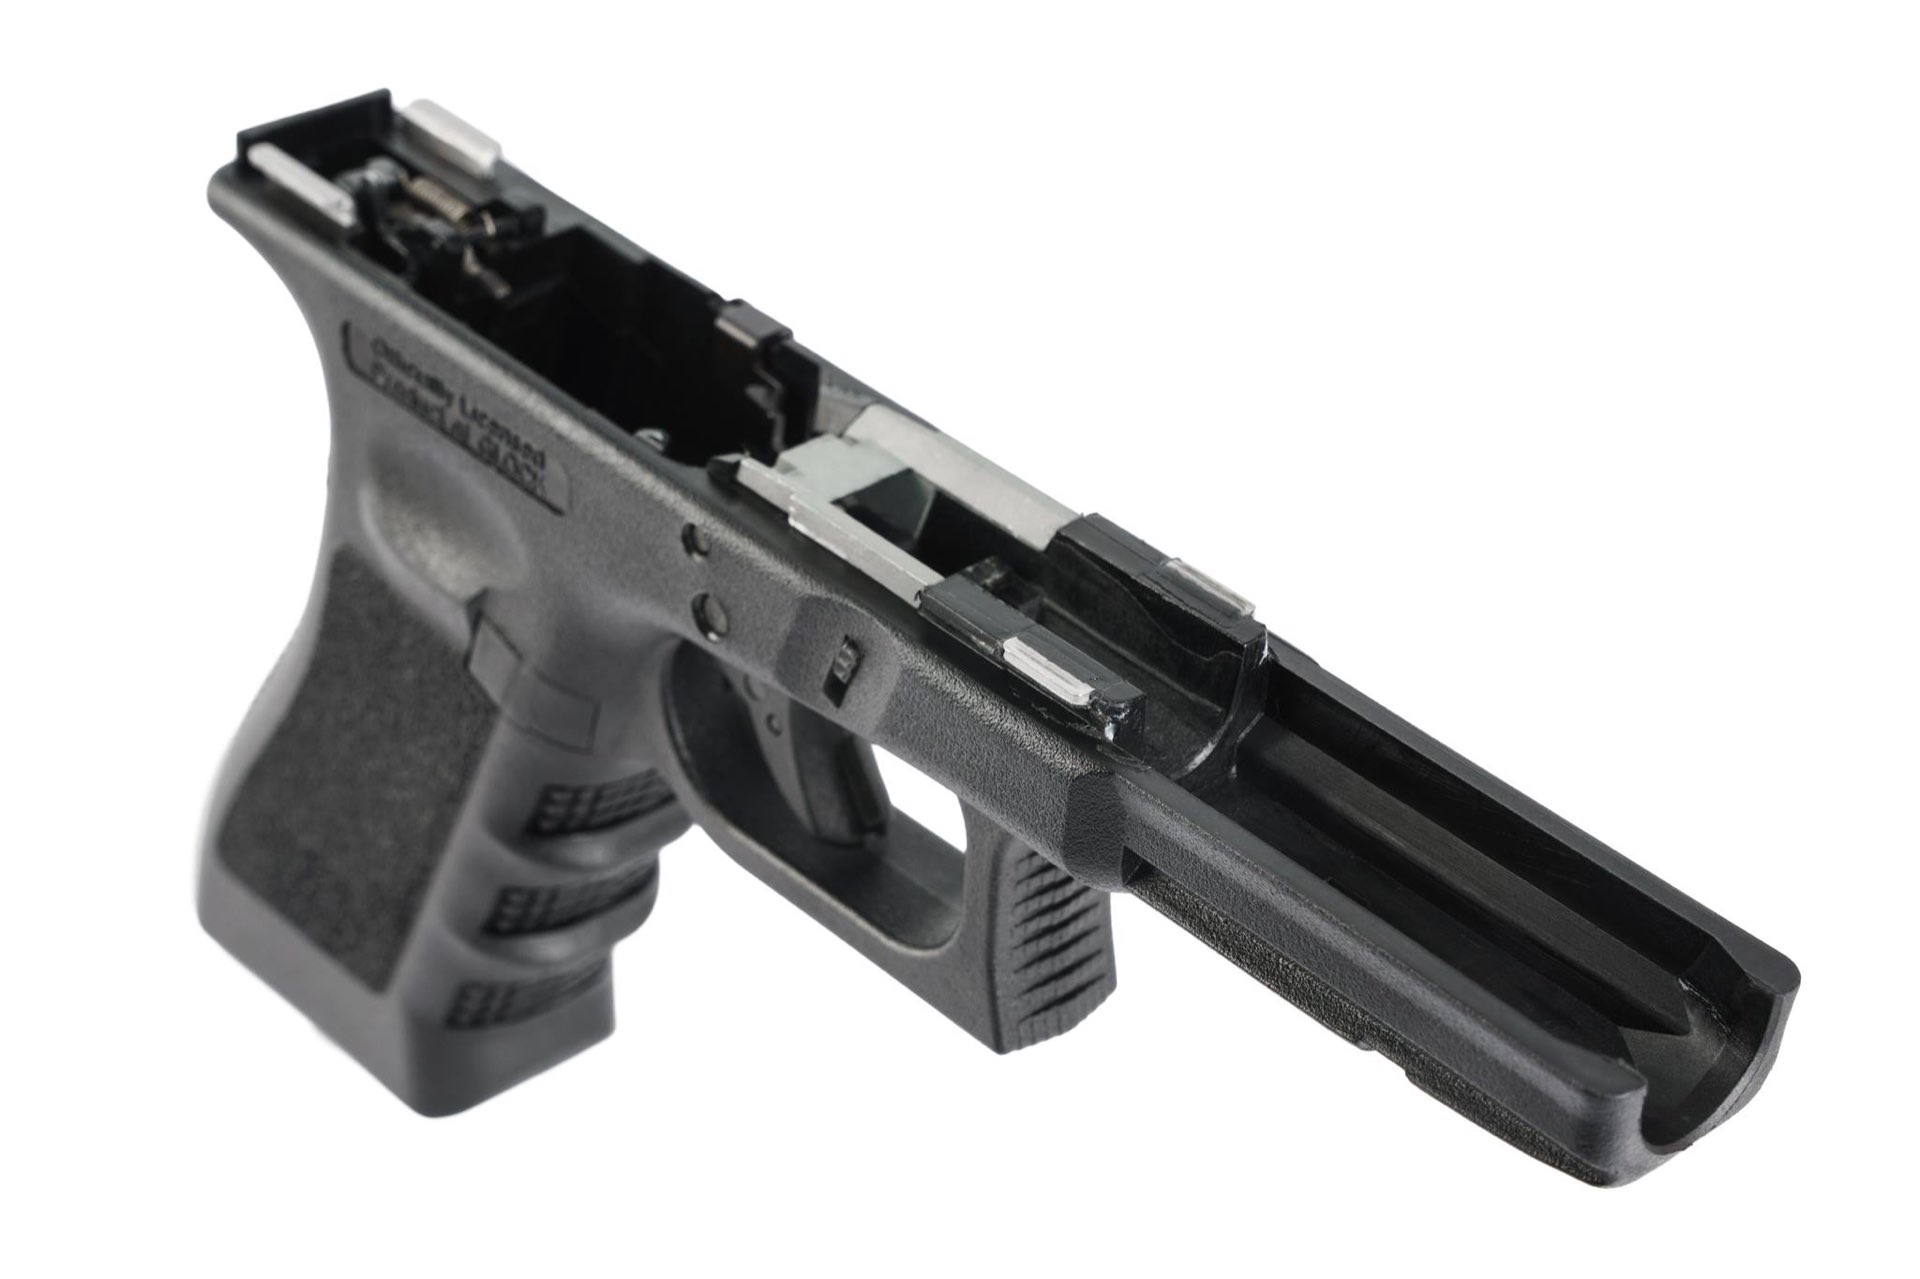 GHK Umarex Glock 17 Gen 3 GBB (szkielet)